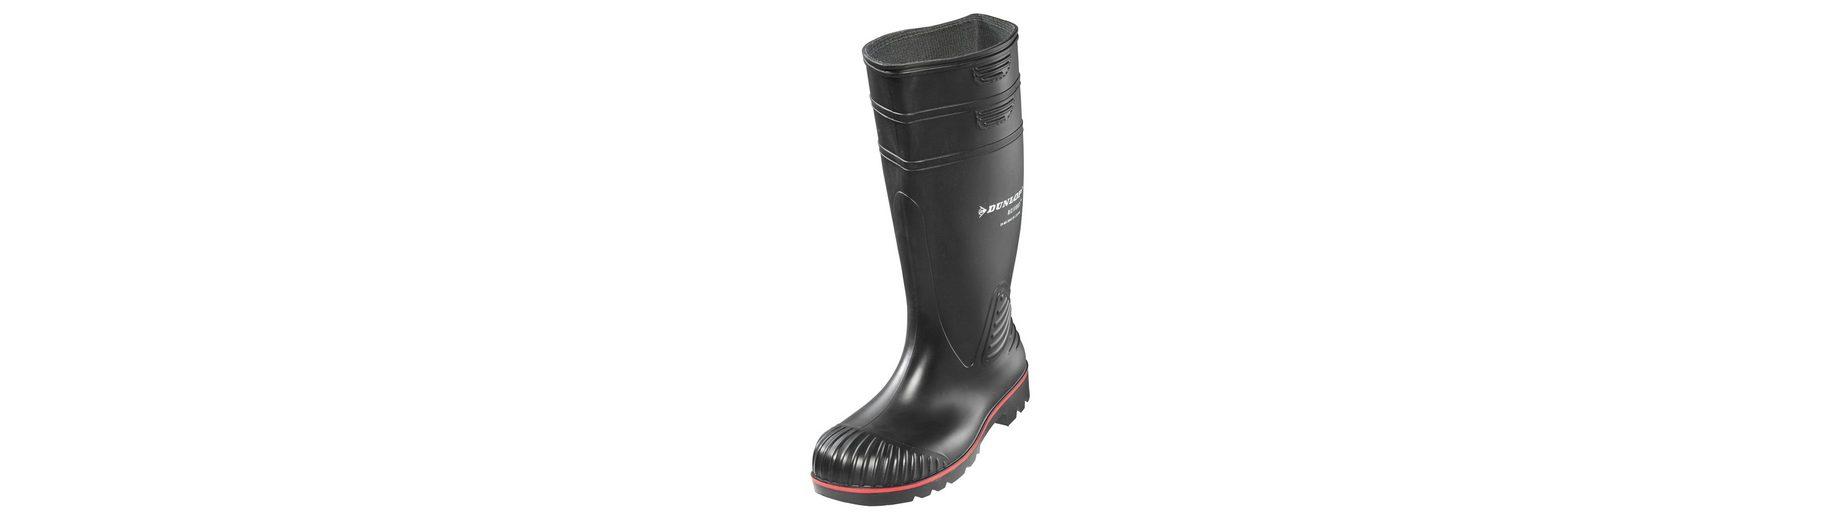 Dunlop Gummistiefel Acifort Stiefel